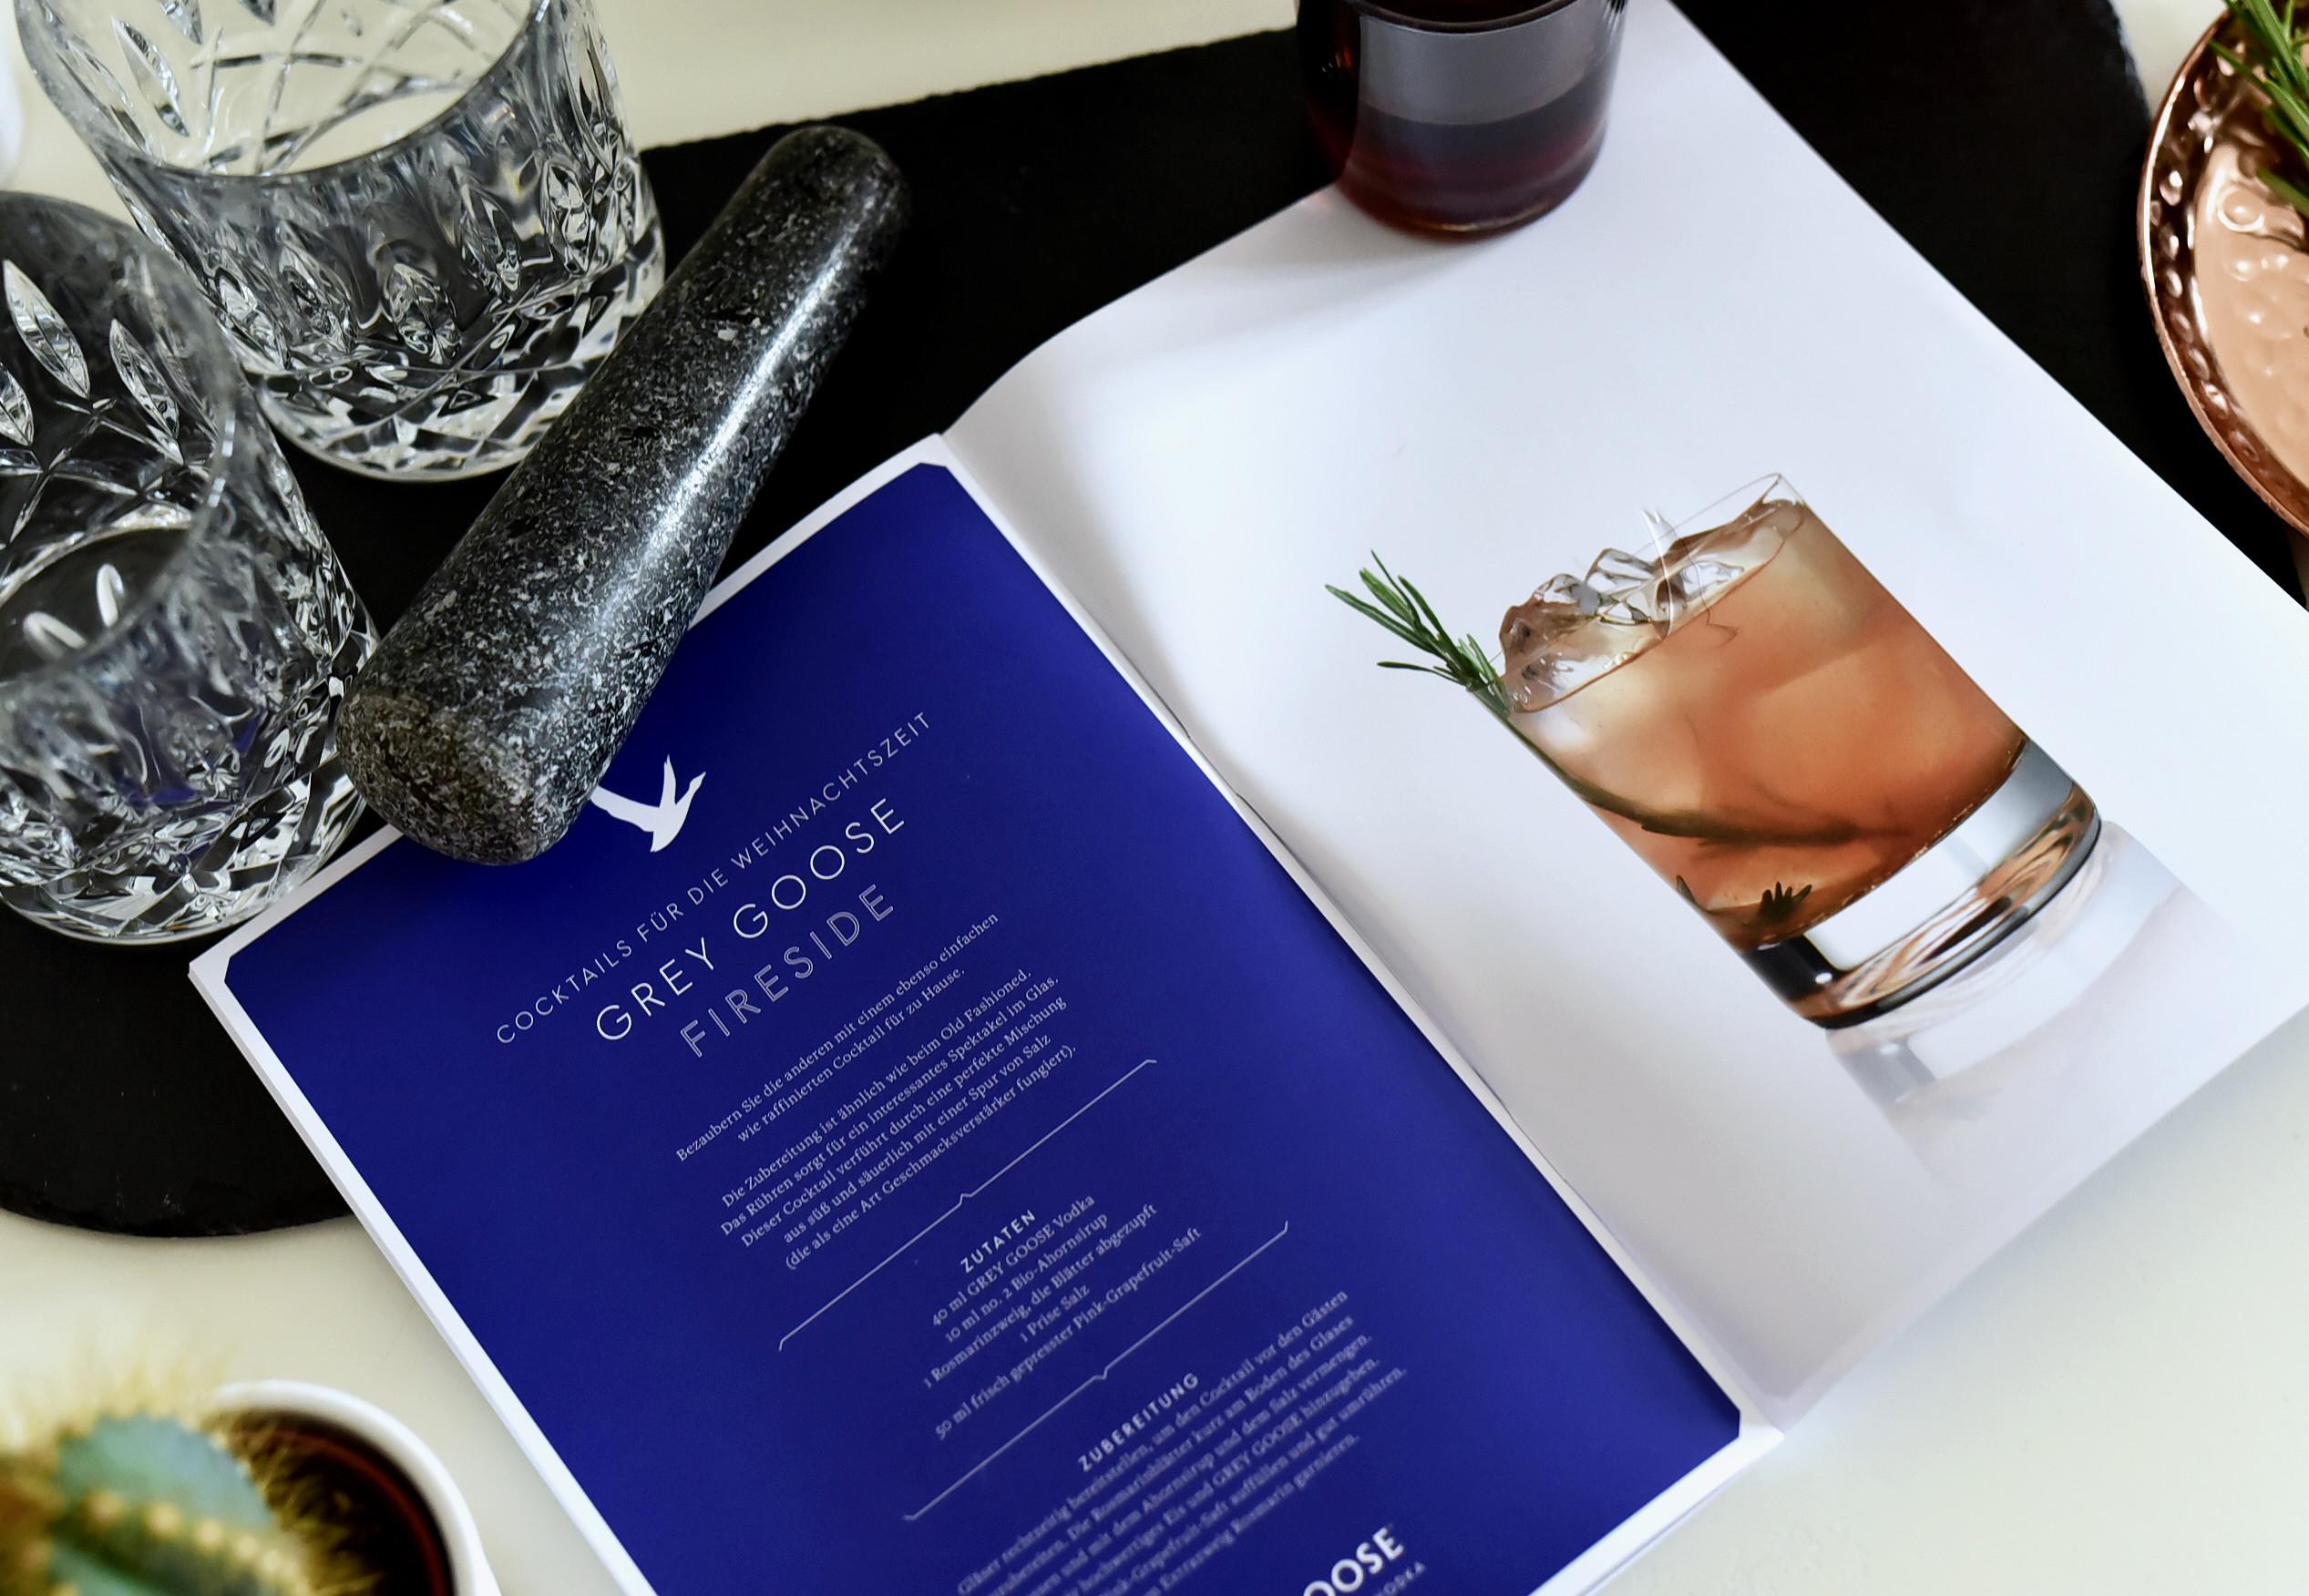 Tommeezjerry-Styleblog-Männerblog-Männer-Modeblog-Berlin-Berlinblog-Männermodeblog-Lifestyleblog-Cocktail-Christmas-Drink-Vodka-Grey-Goose